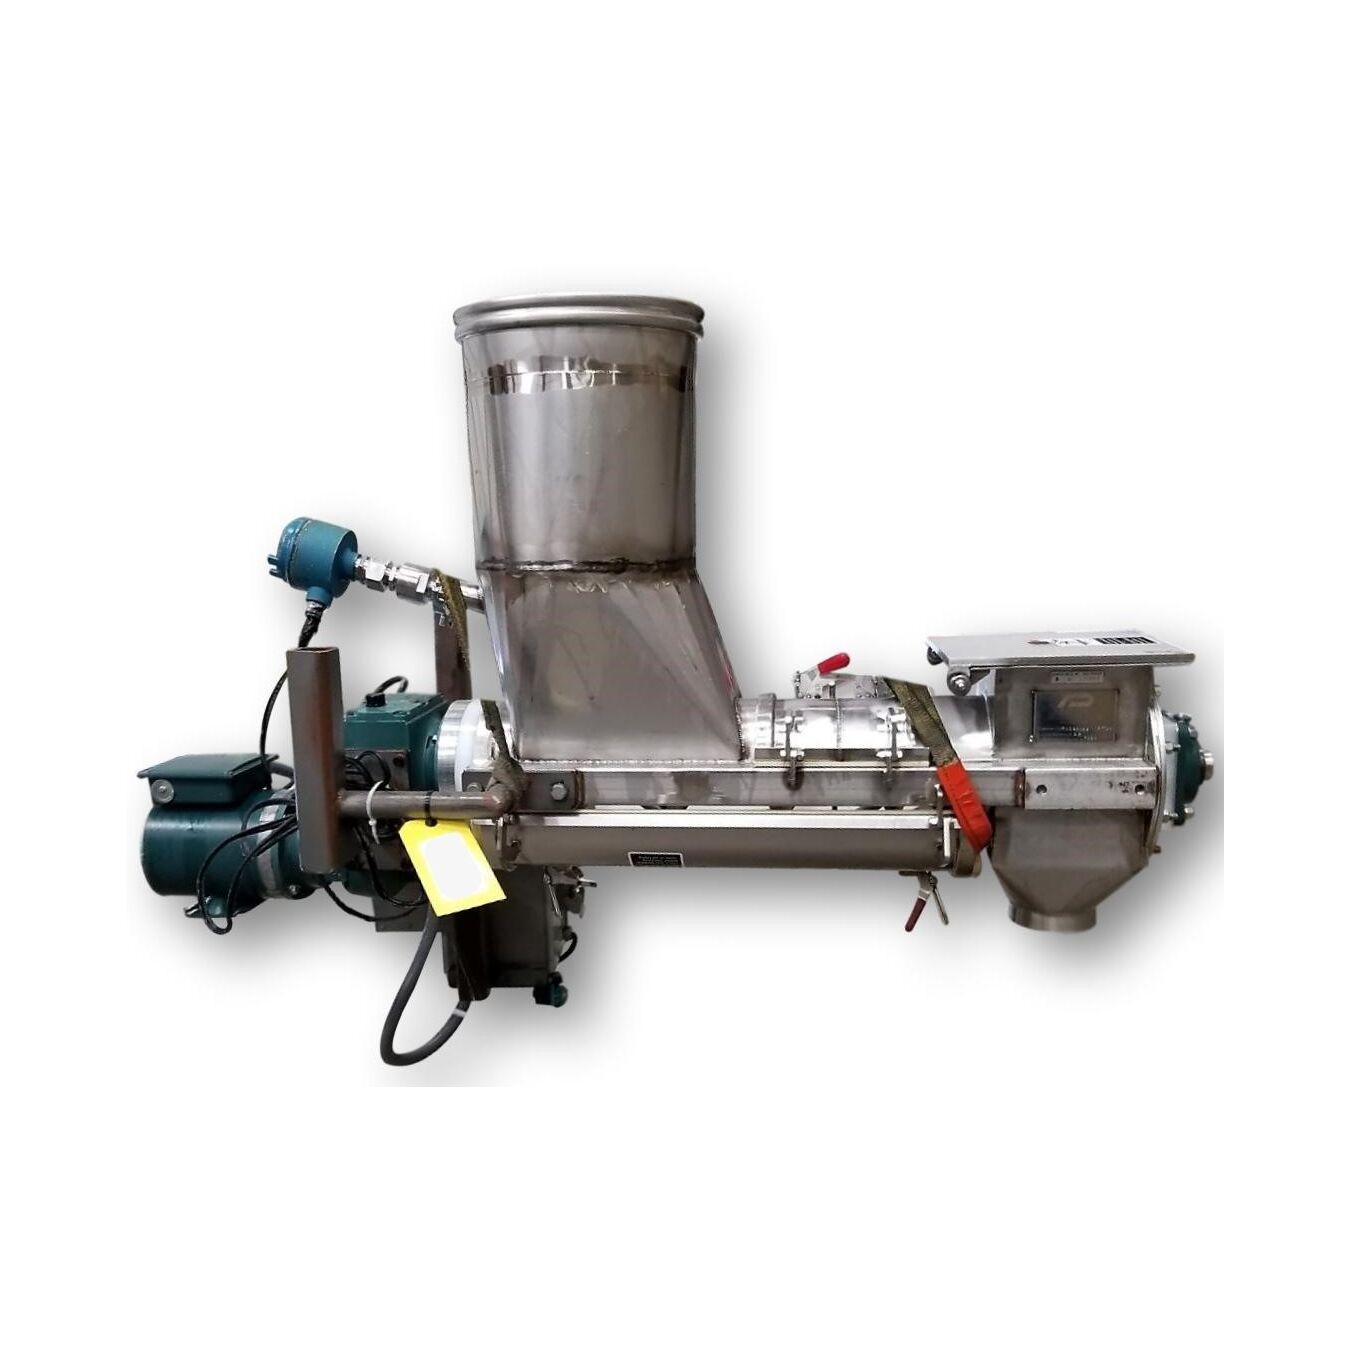 com aliba on att of auger charming screw photo x buy product feeder alibaba conveyor